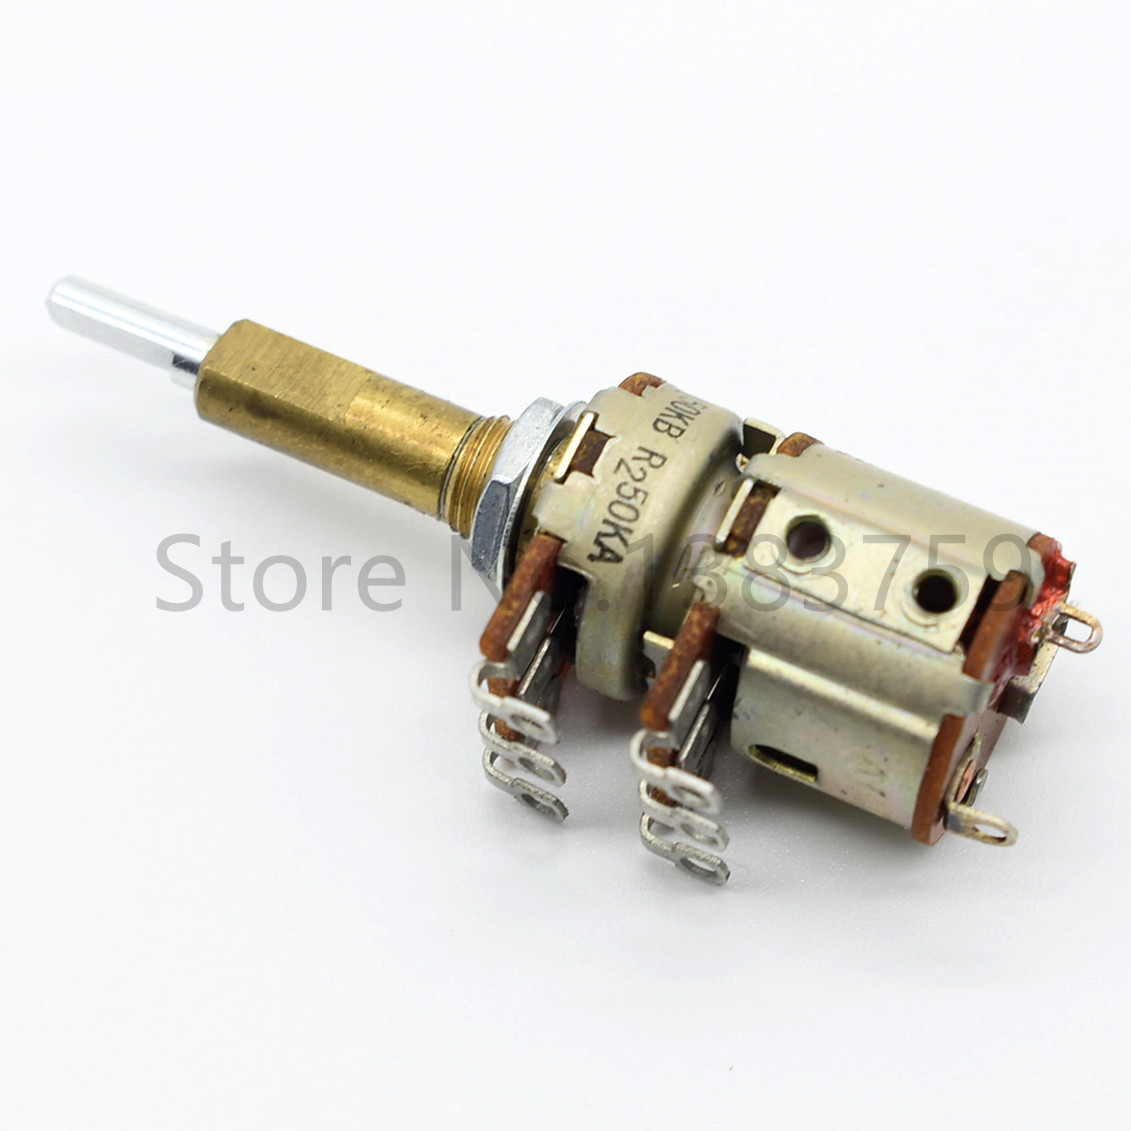 Двойной потенциометр с переключателем A50K и B50K, 16 типов, длина вала 30 мм